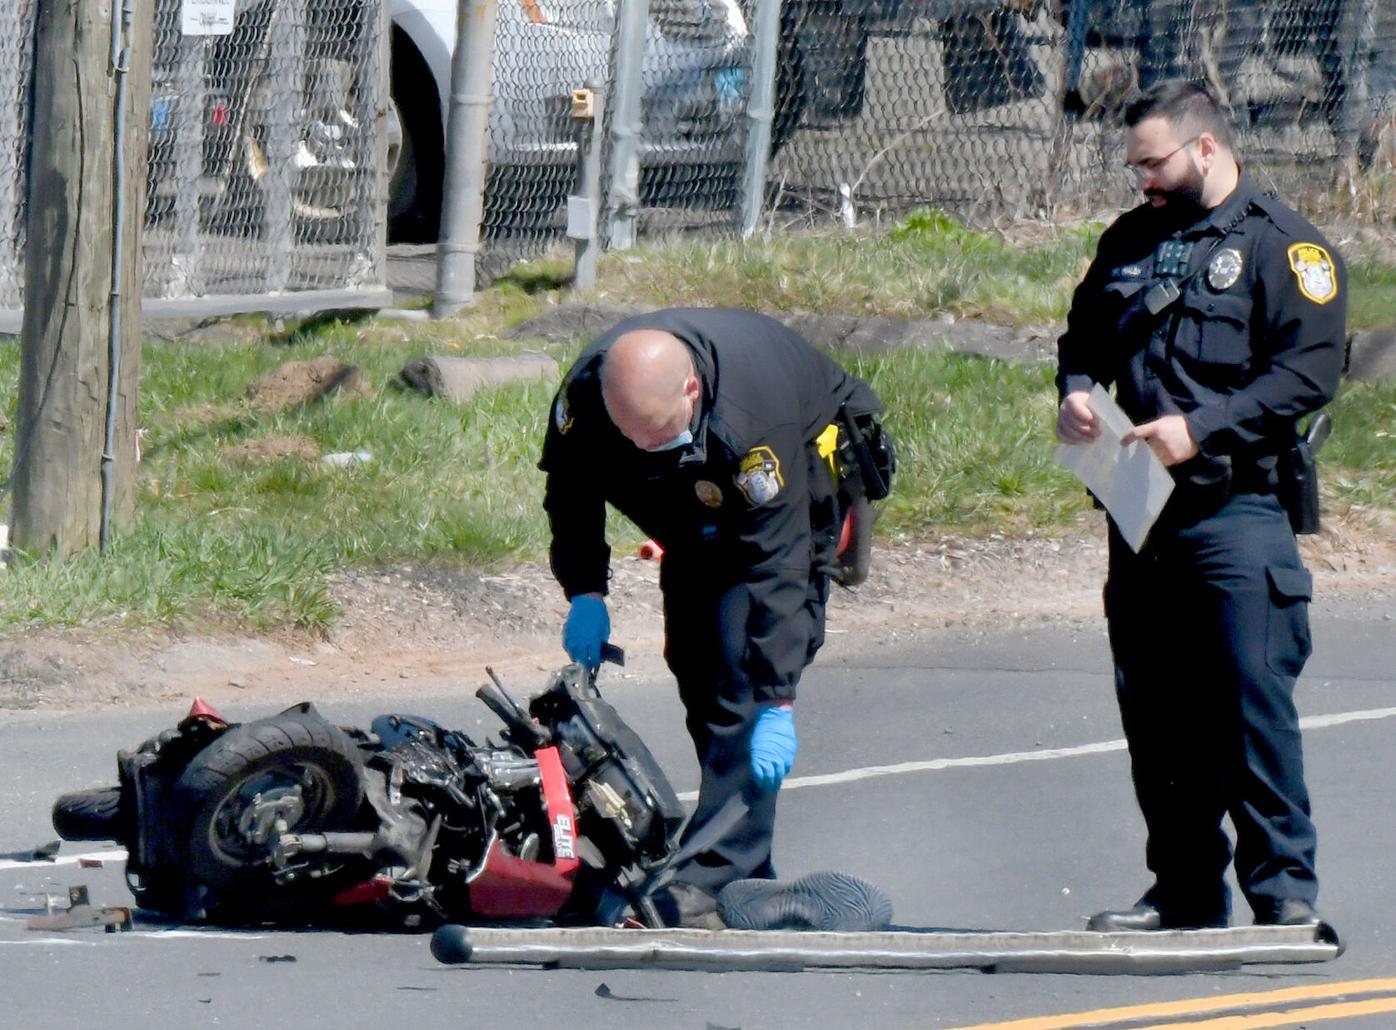 040621 EW Motorcycle Accident 01.jpg